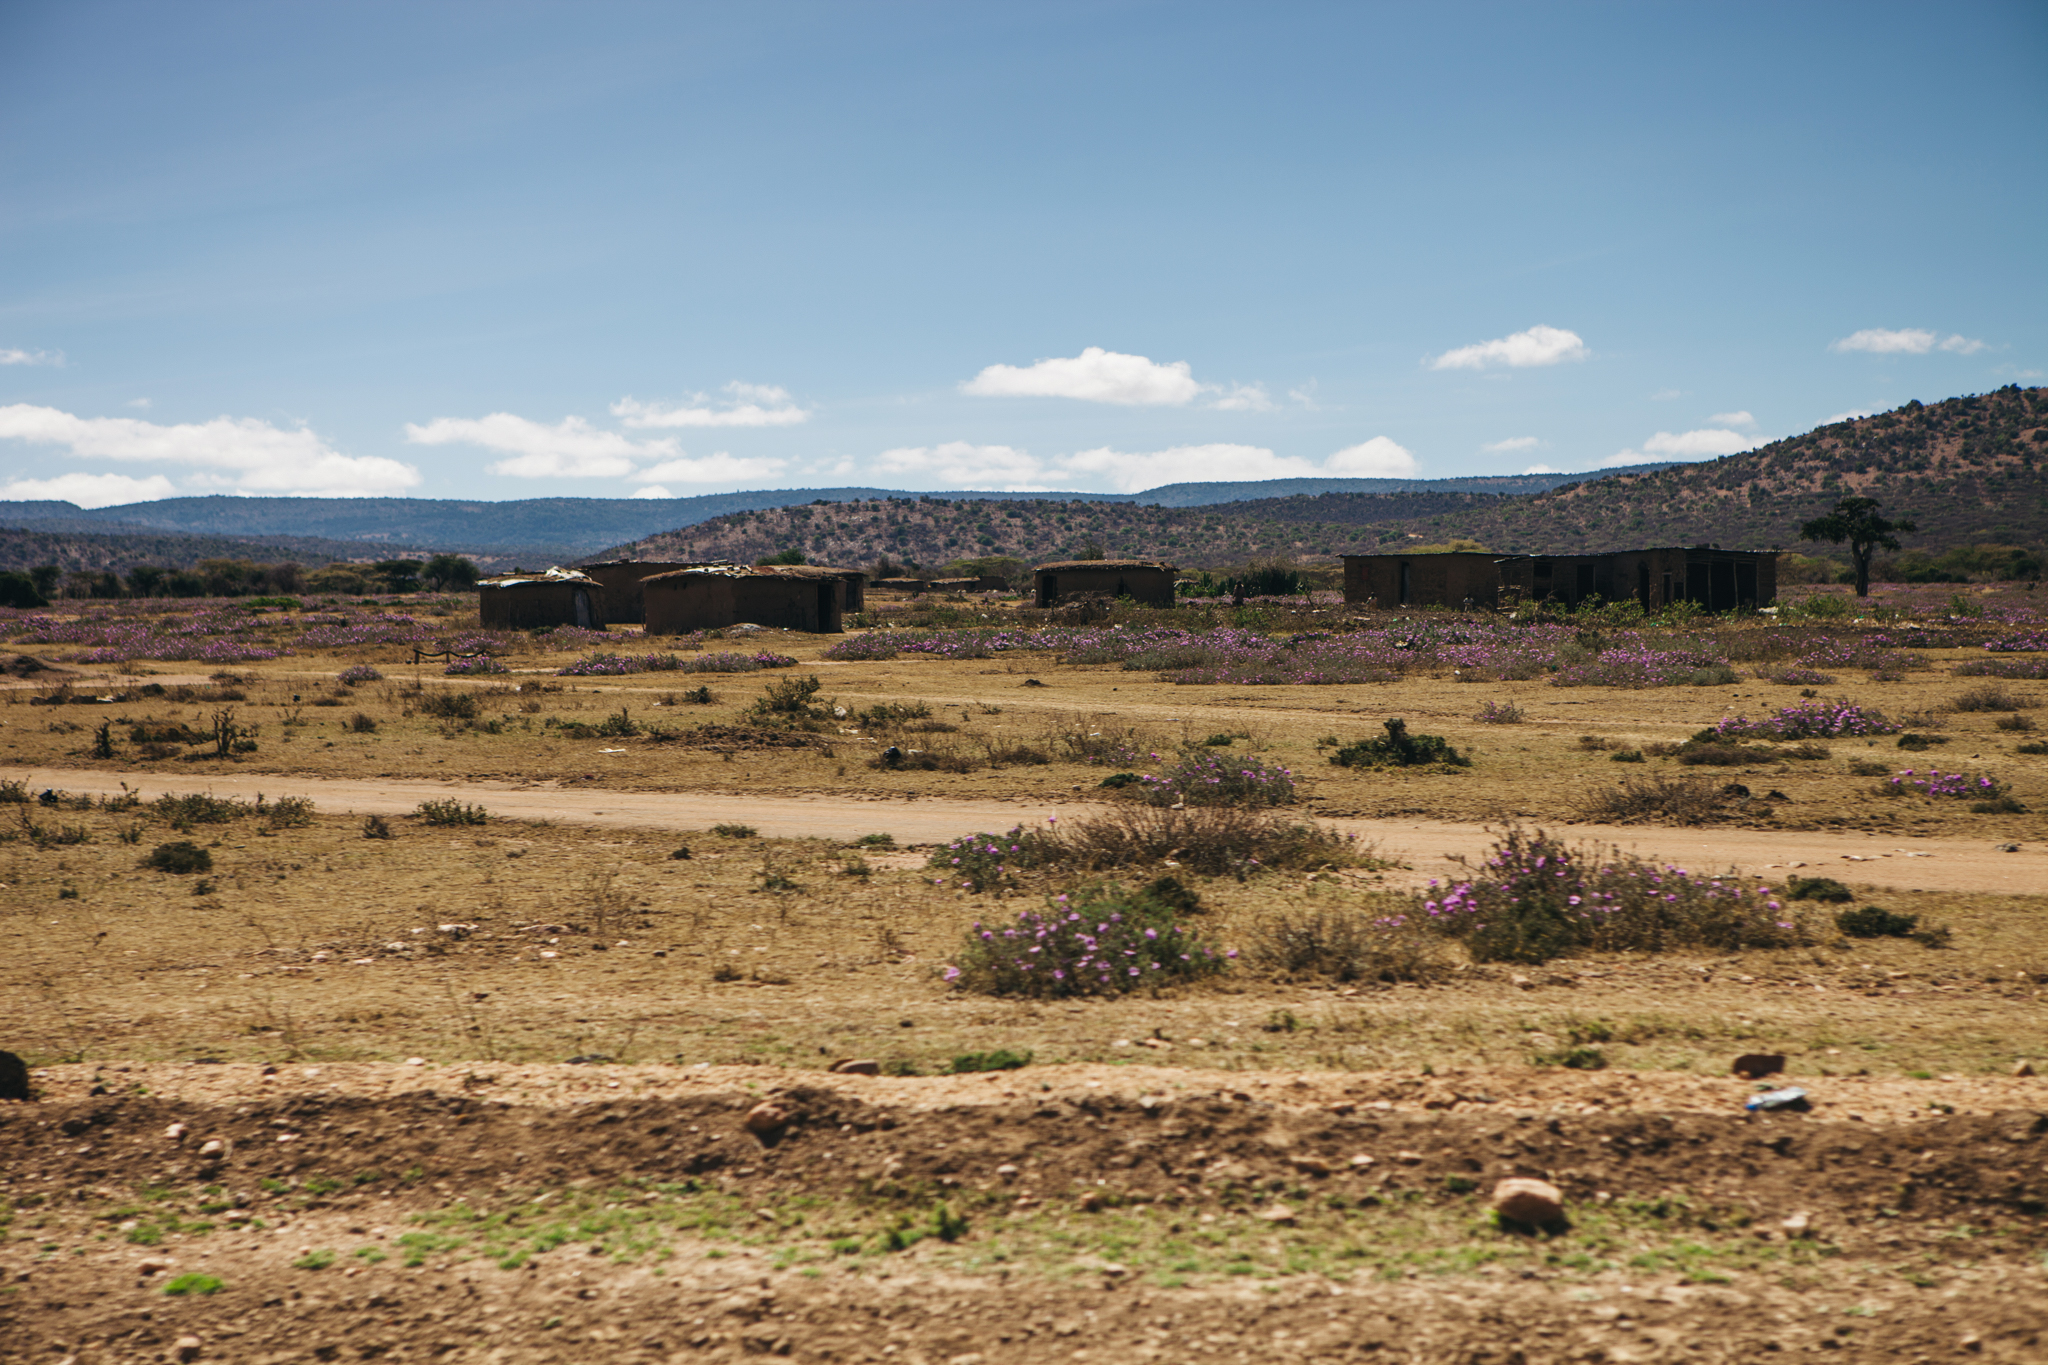 Kenya-164.jpg